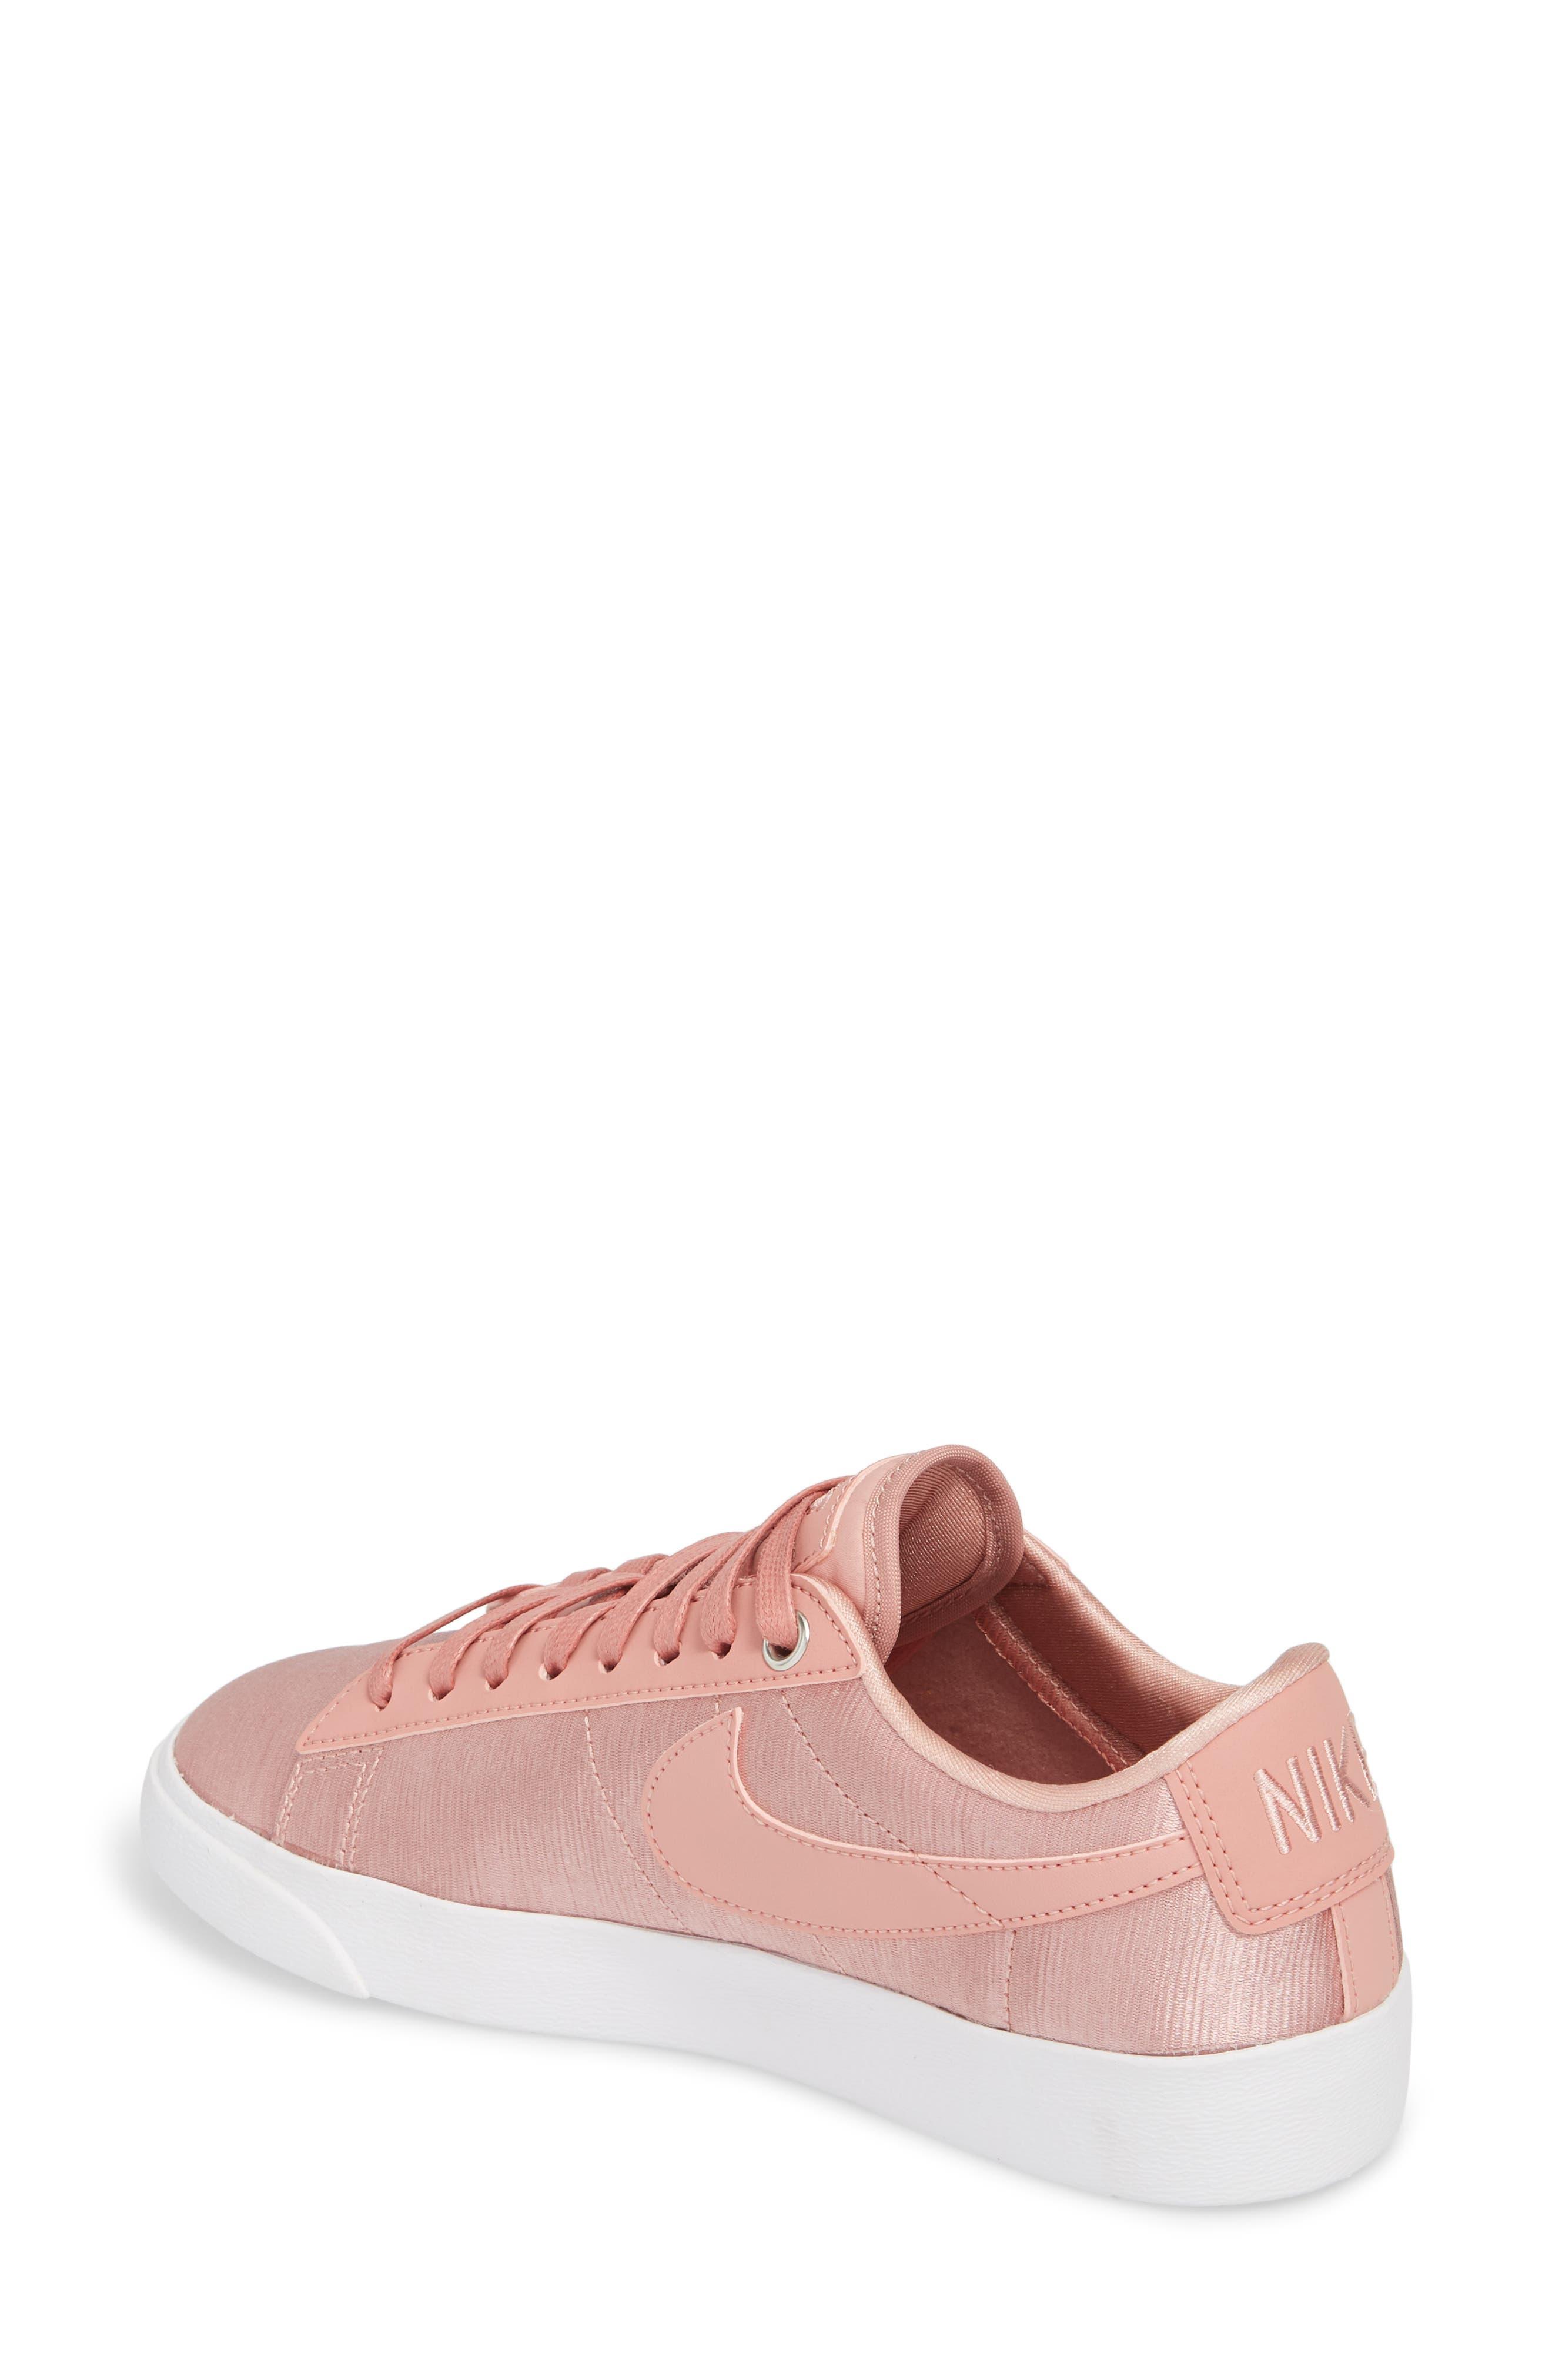 Blazer Low SE Sneaker,                             Alternate thumbnail 2, color,                             RUST PINK/ RUST PINK